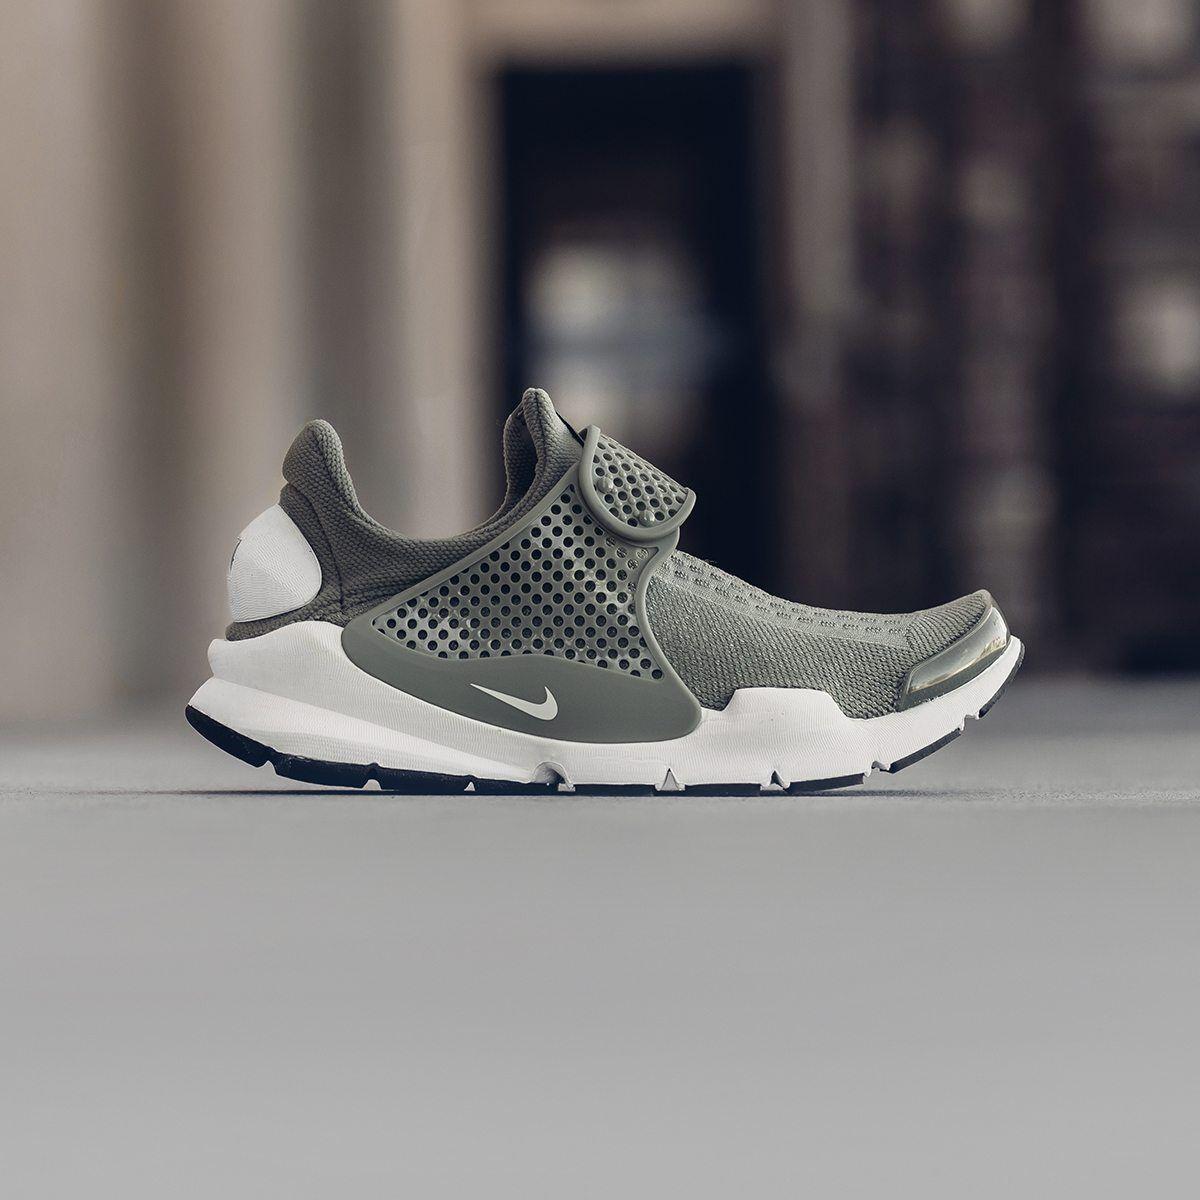 2018 WMNS Nike Sock Dart SE SZ Stucco 6 Dark Stucco SZ Taupe Gris 862412-005 33ad60